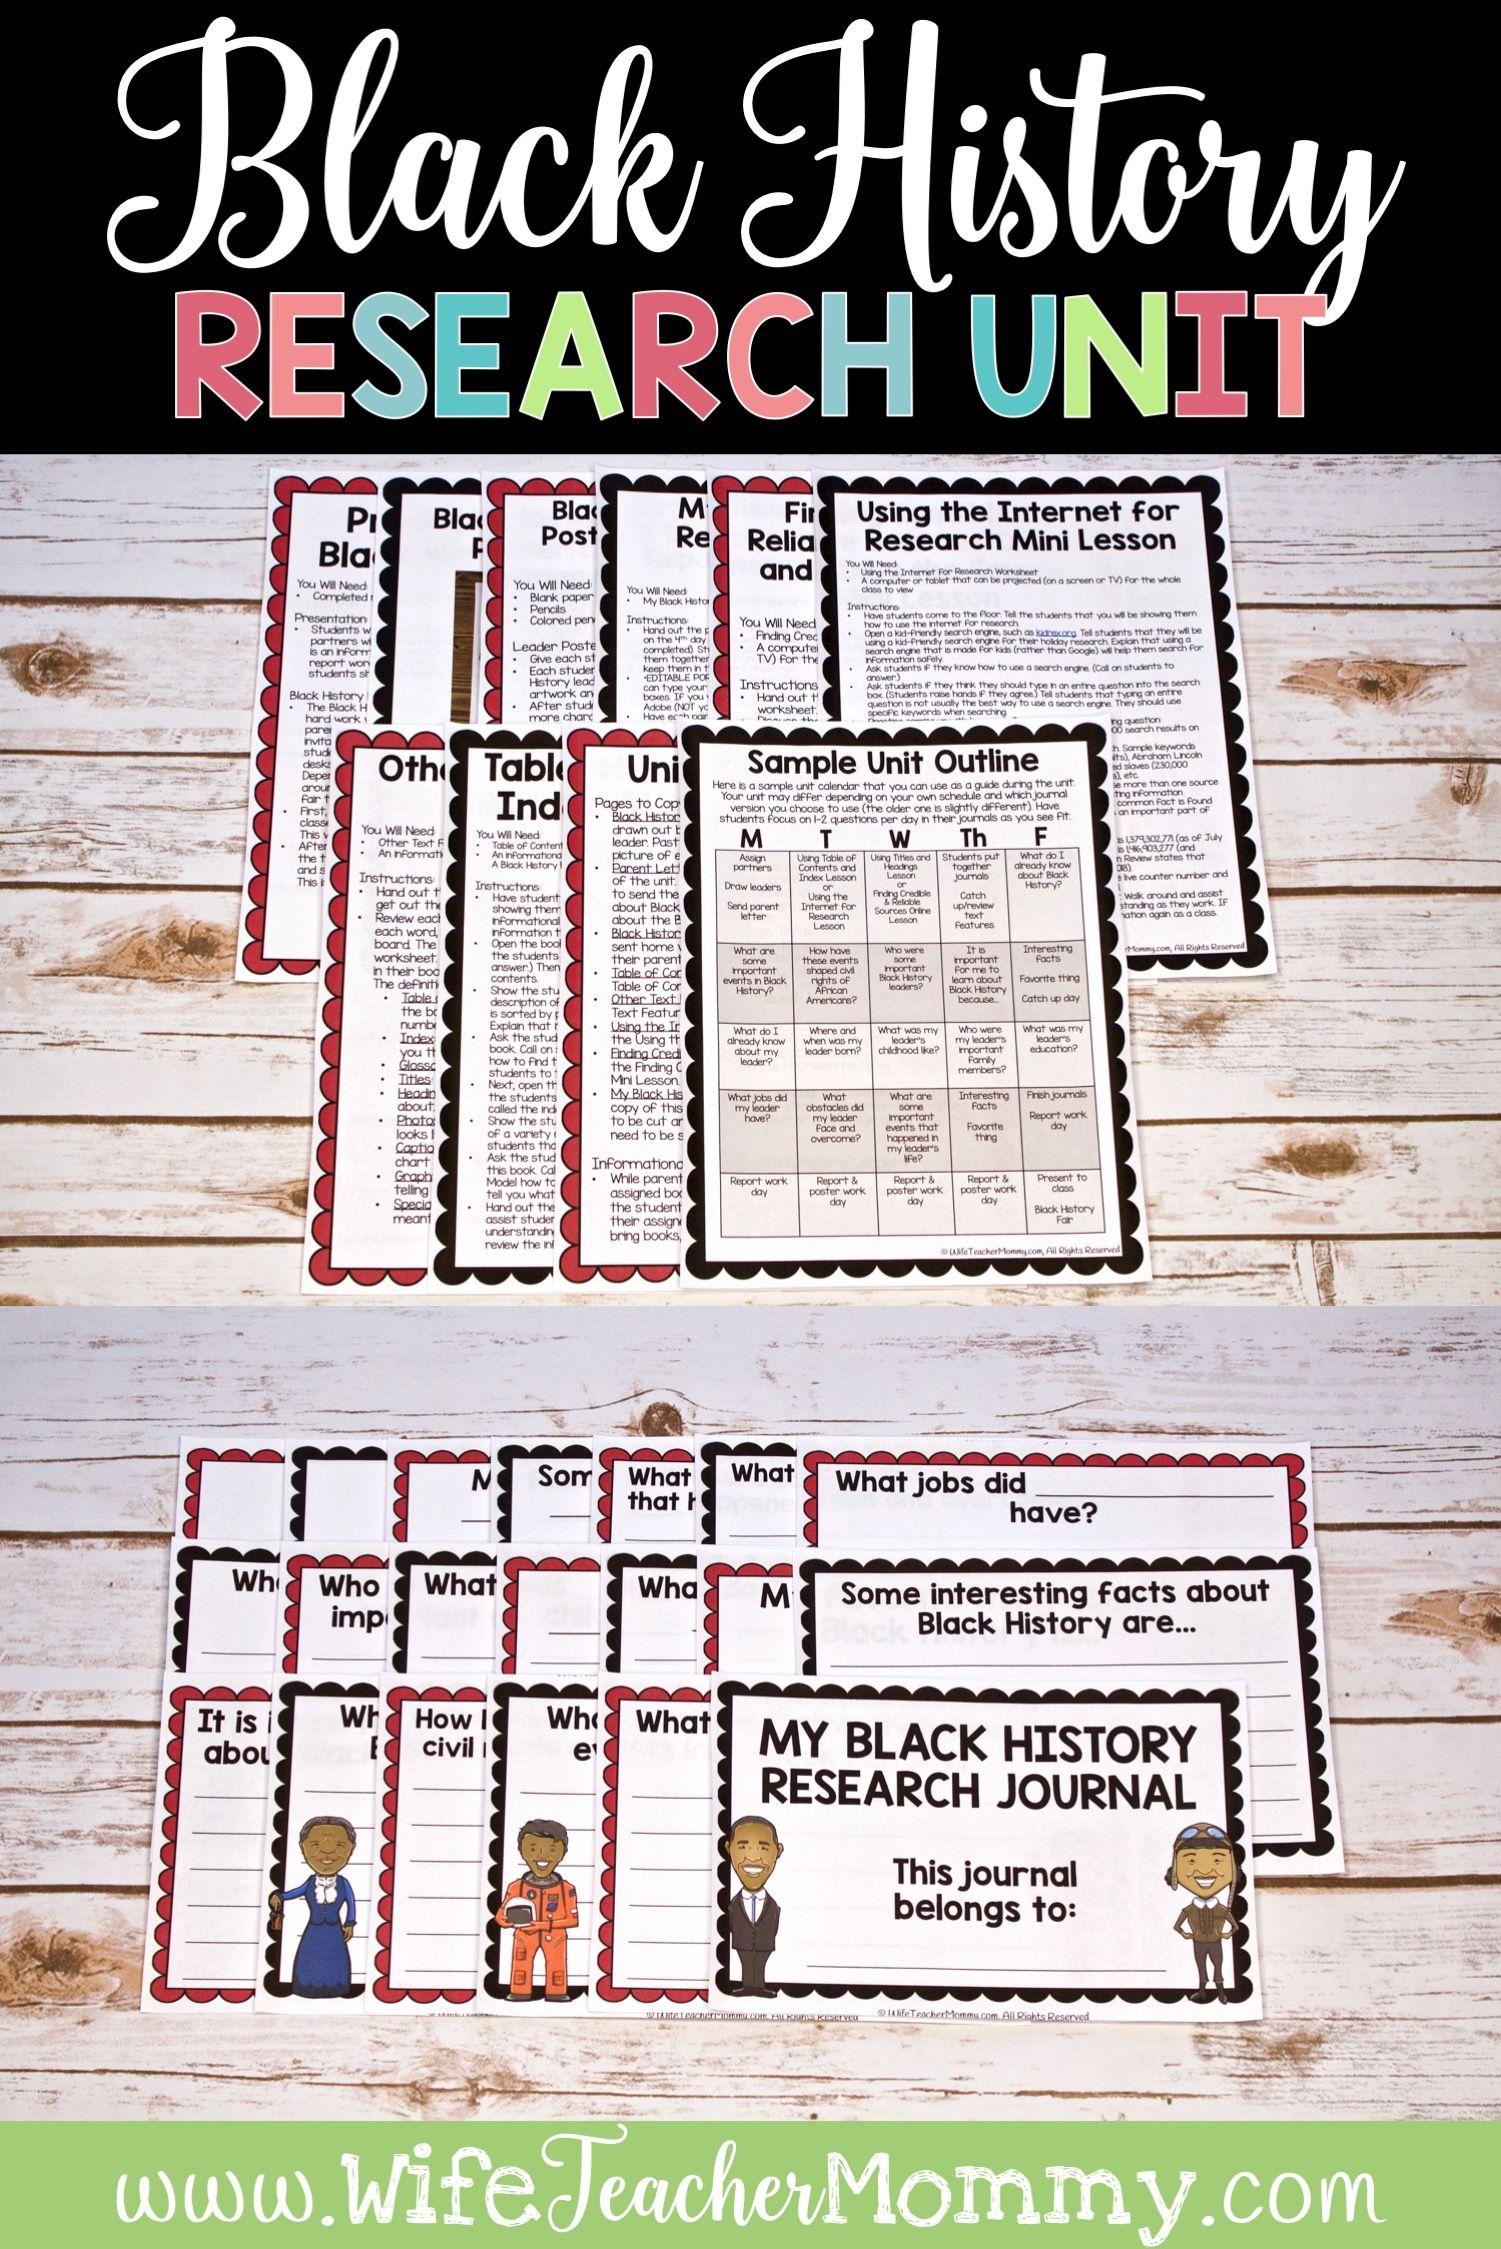 Black History Research Unit